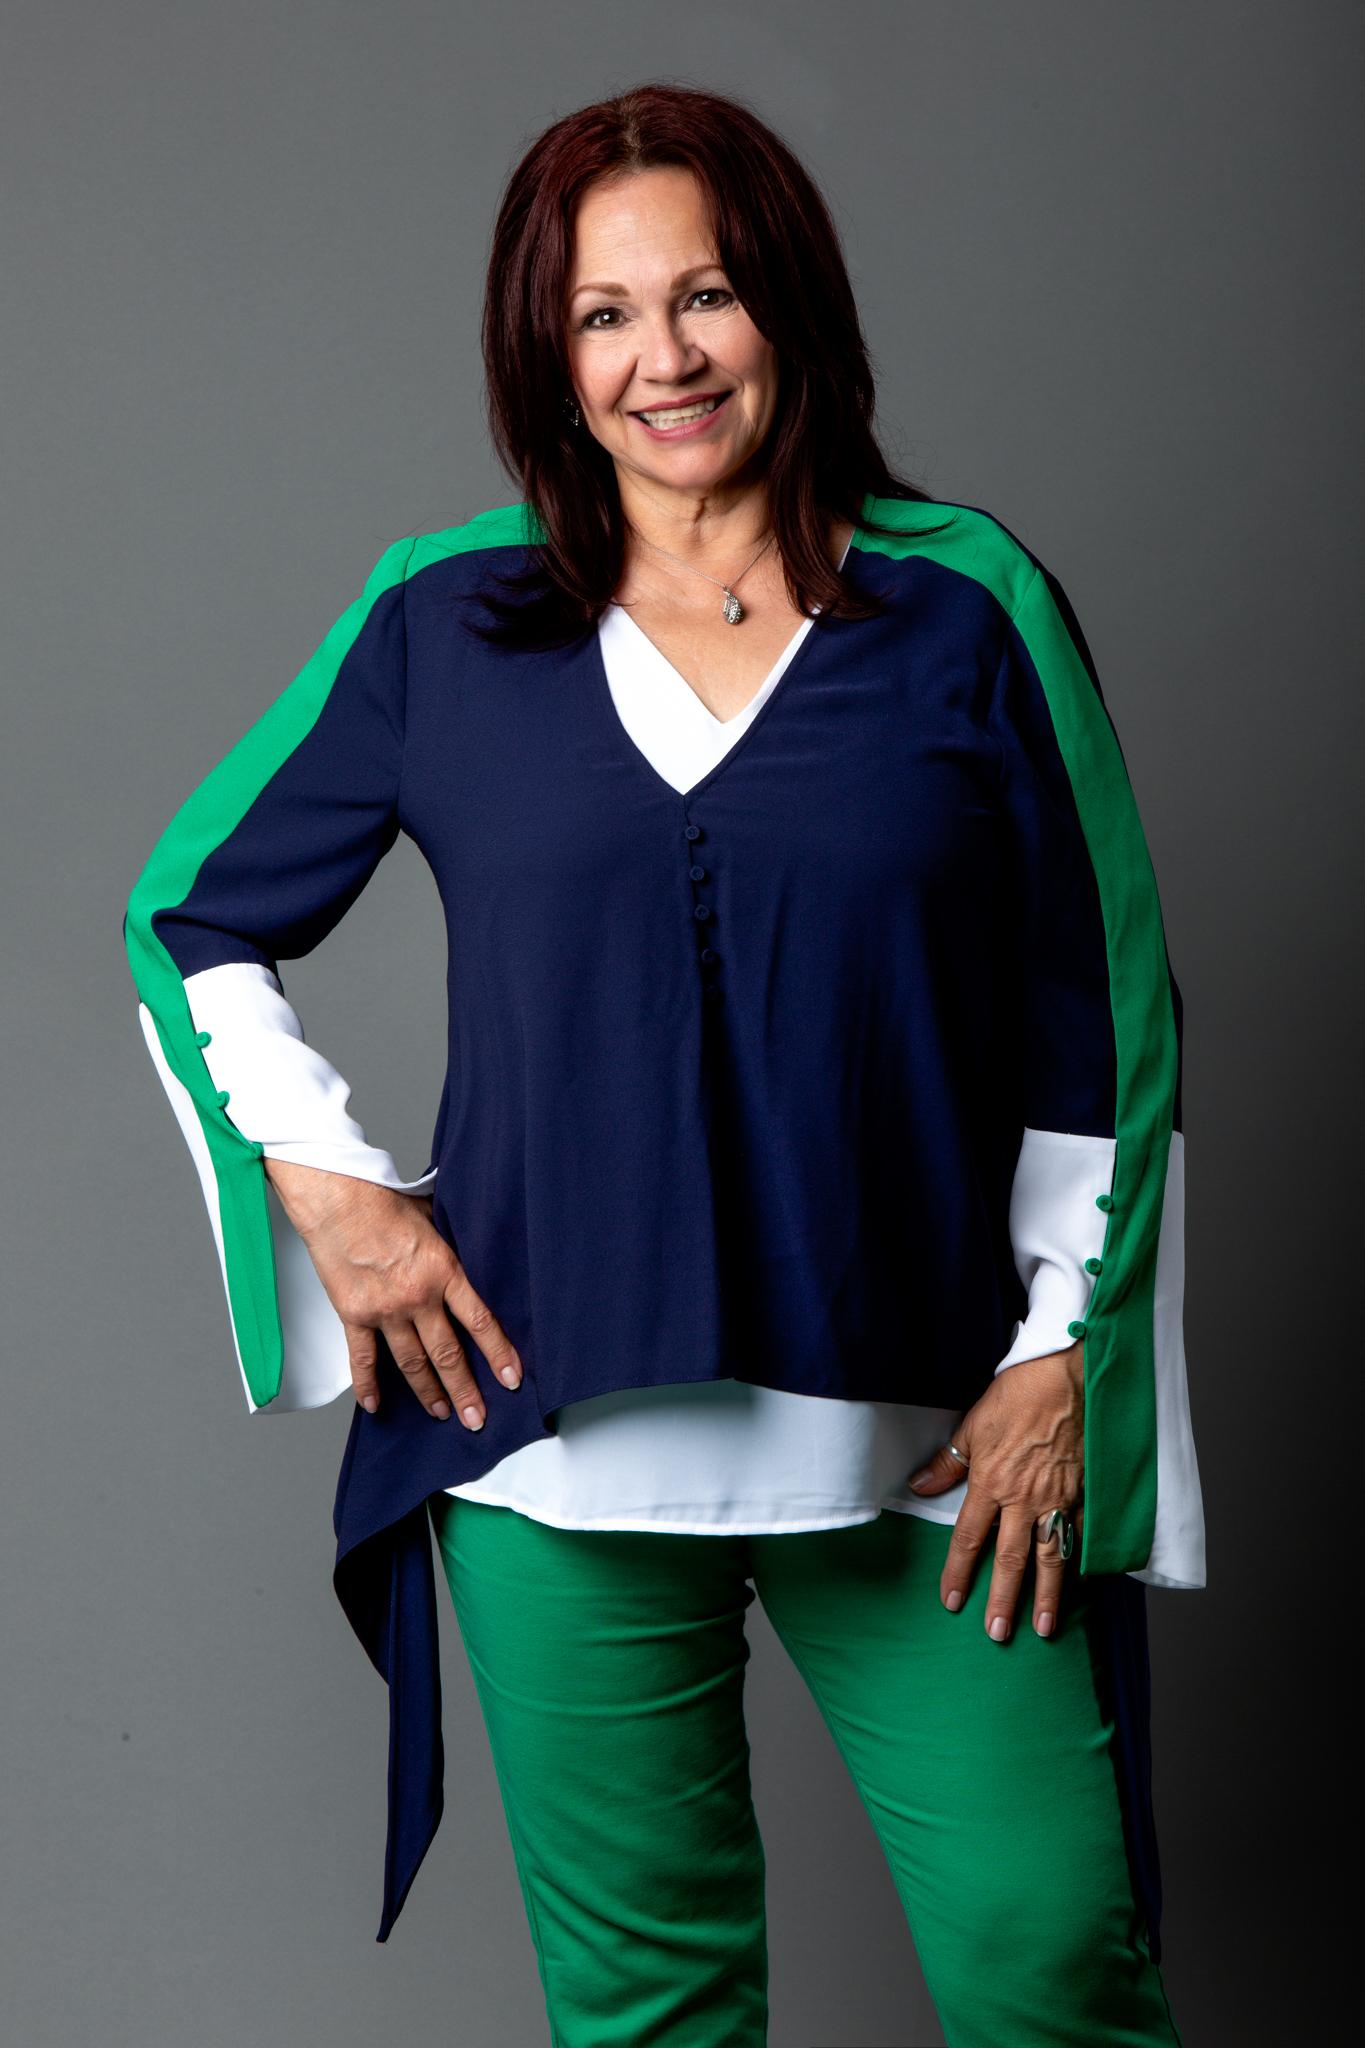 Sharon undefined Vasquez